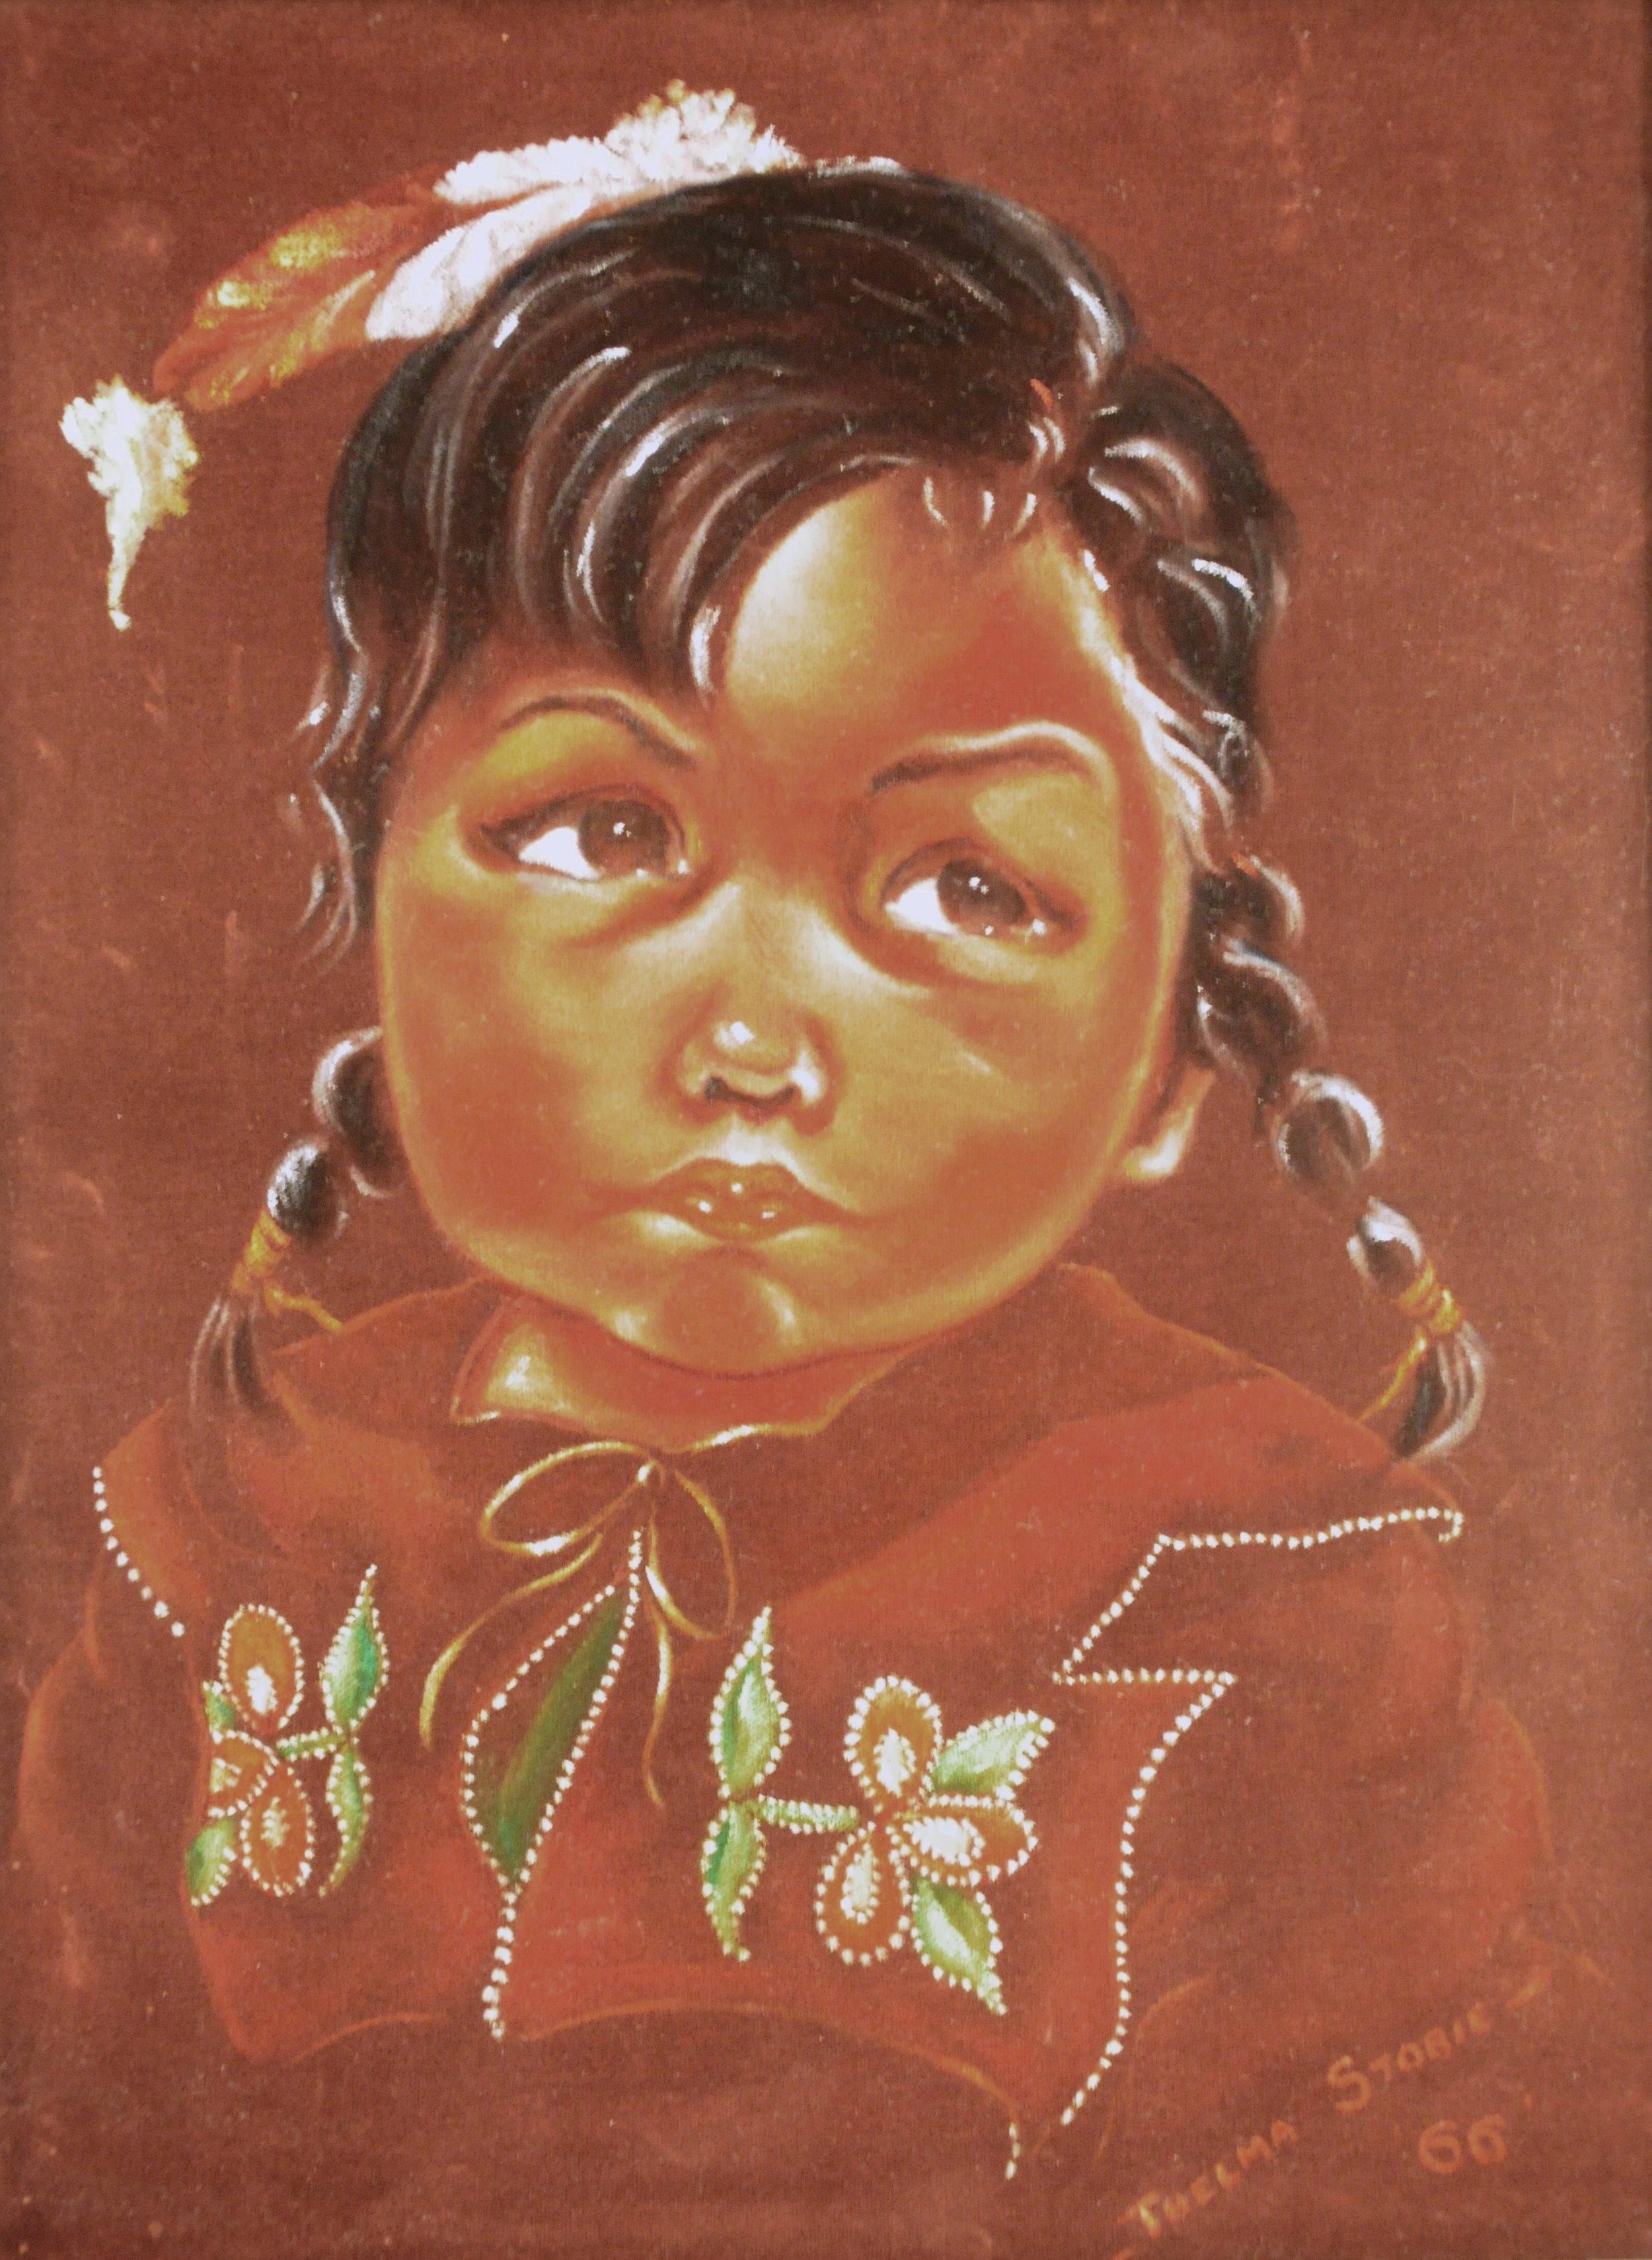 Untitled (Portrait of Child), 1966, Thelma Stobie, acrylic on velvet